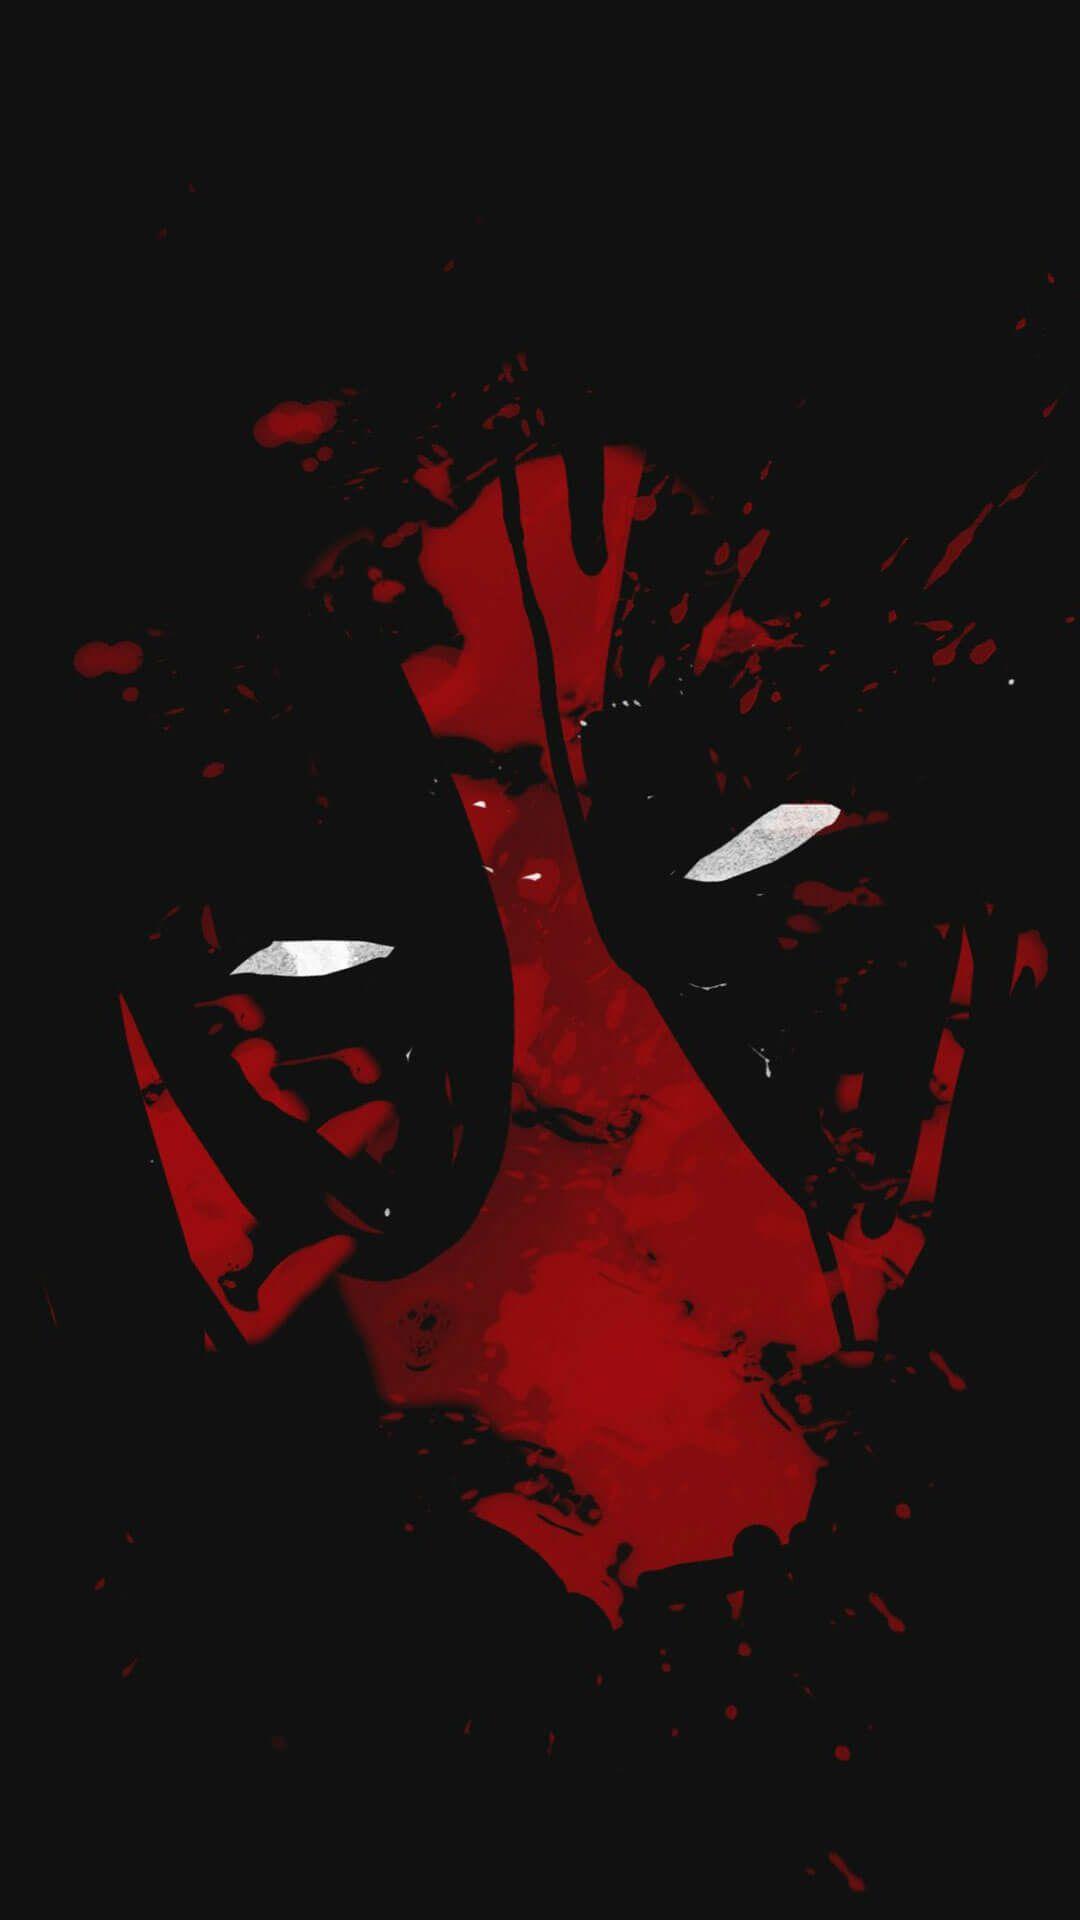 Deadpool Deadpool Pinterest Deadpool Wallpaper Deadpool And